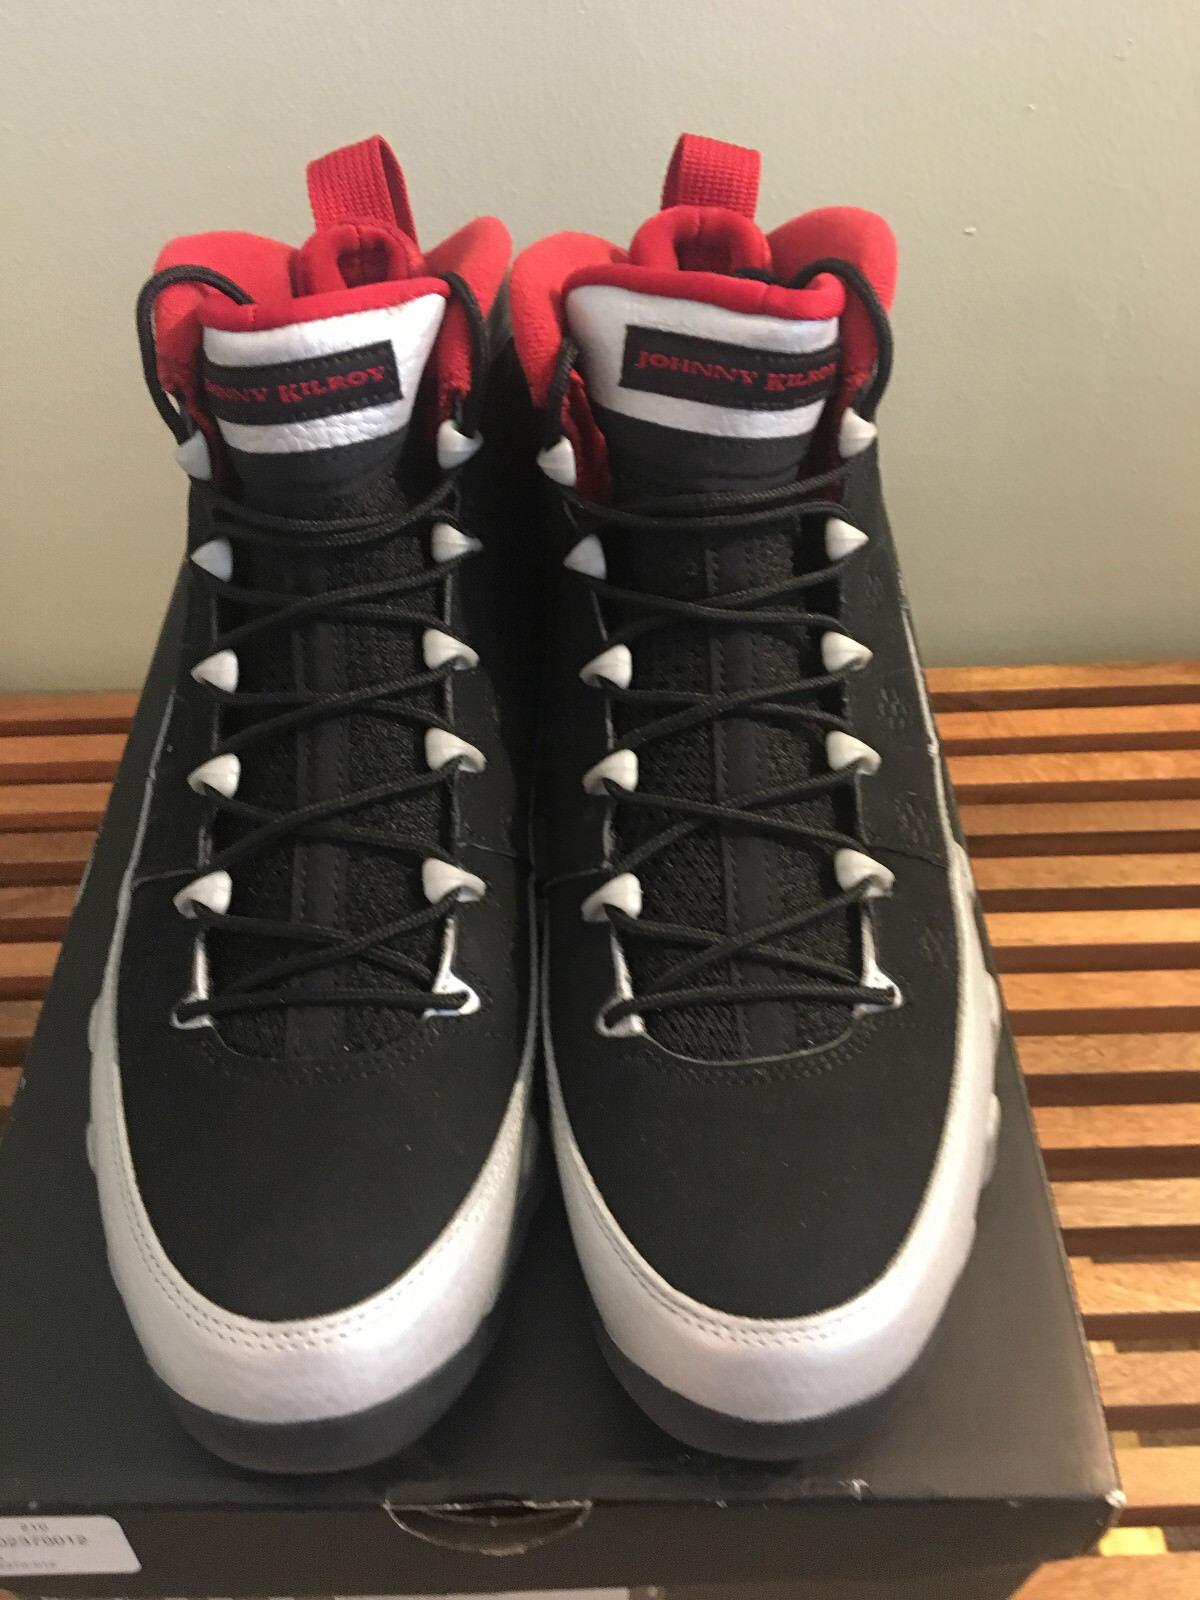 Air Jordan 9 Retro Black/Gym Red-MTLC Platinum Size 10